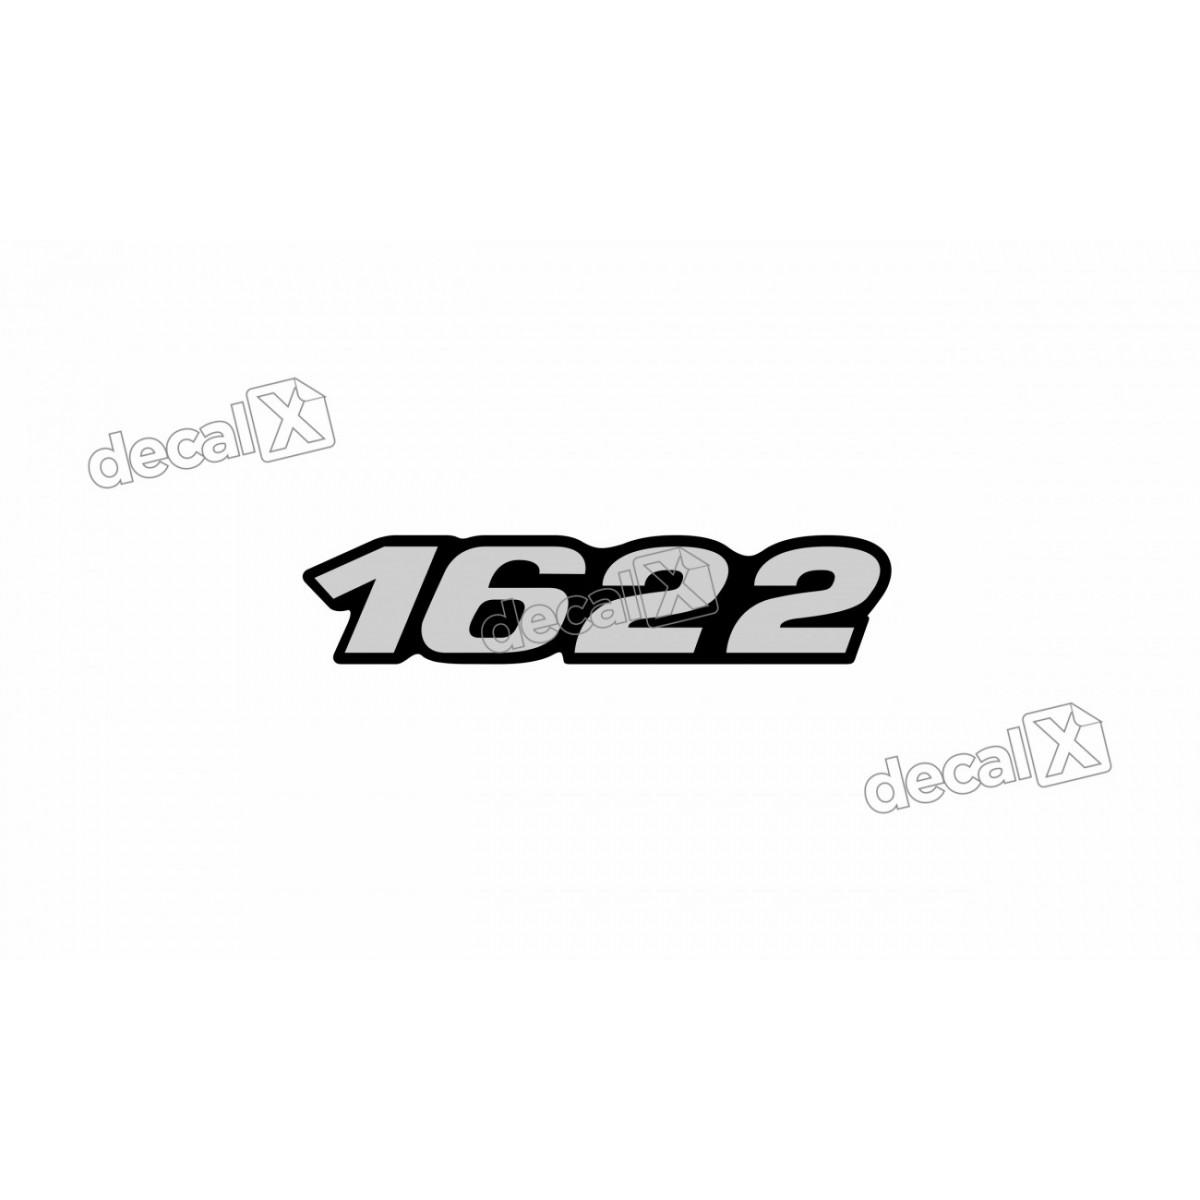 Adesivo Emblema Resinado Mercedes 1622 Cm49 Decalx